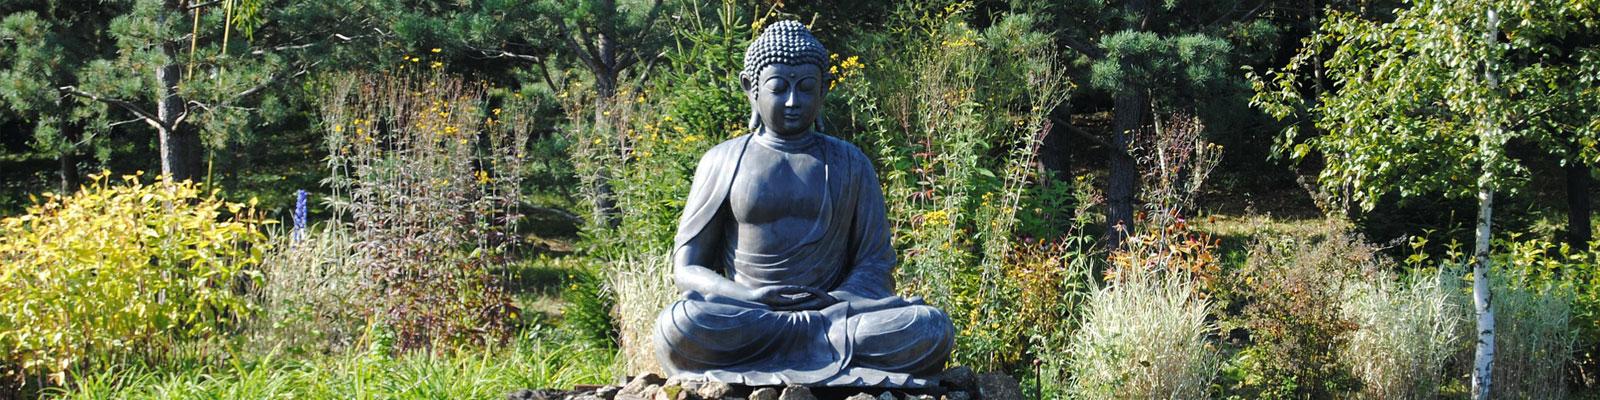 yoga prive les en zwangerschapsyoga in Genk, Limburg